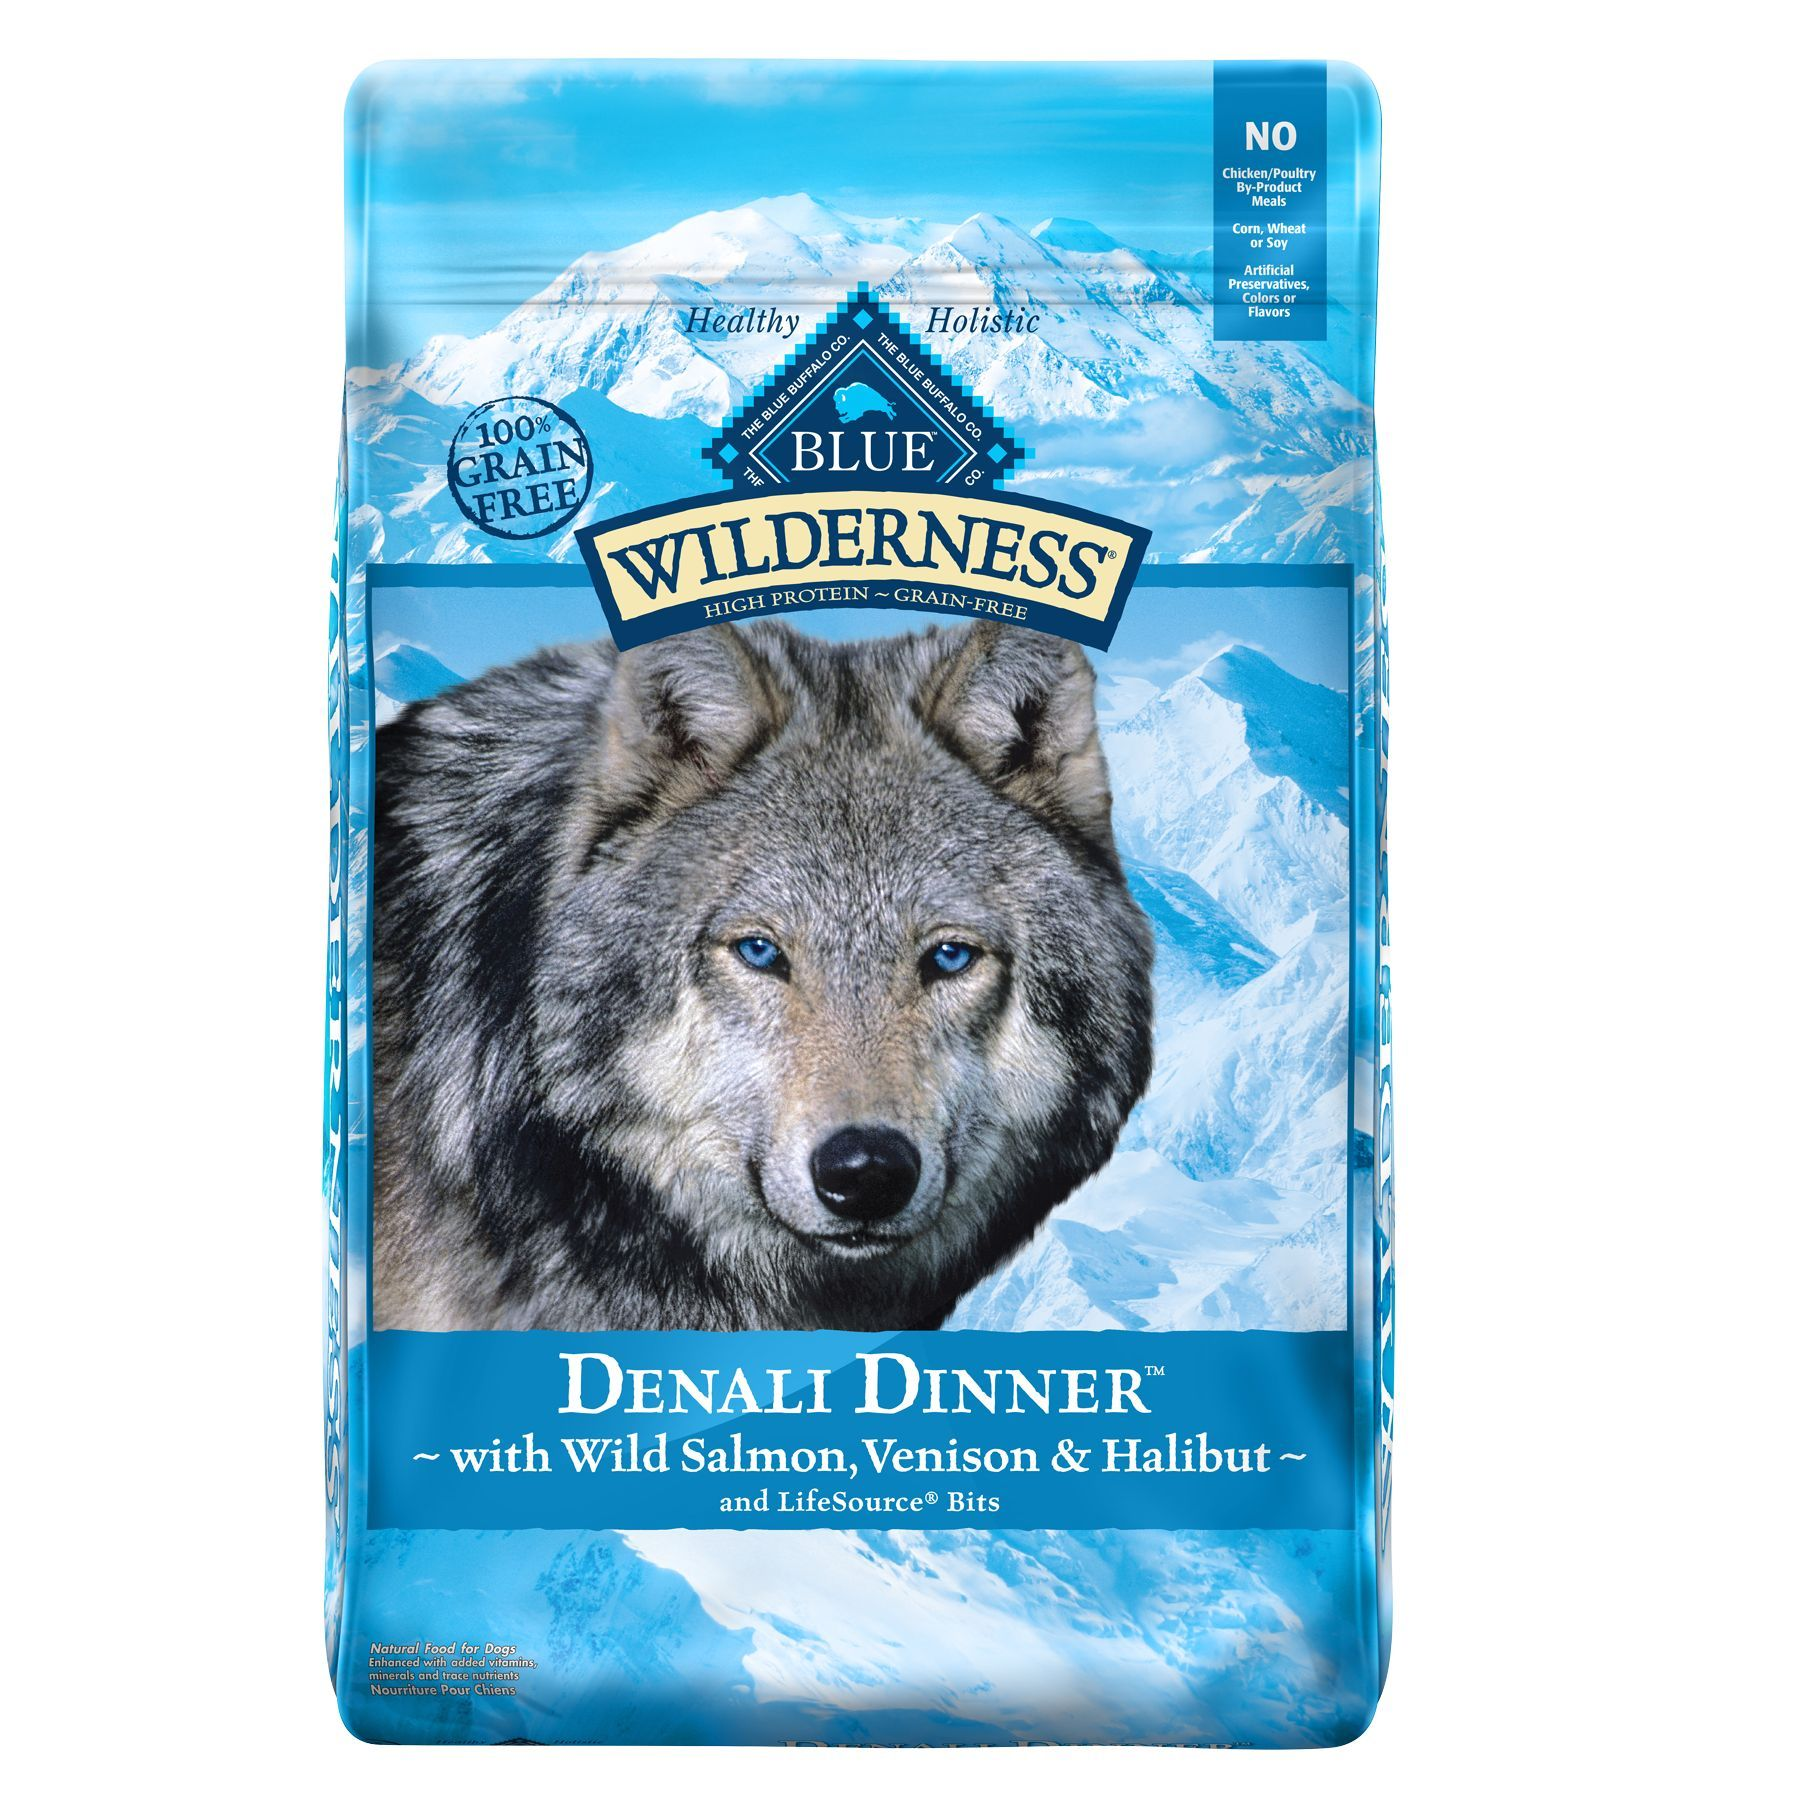 Blue Buffalo Wilderness Denali Dinner Dog Food Grain Free